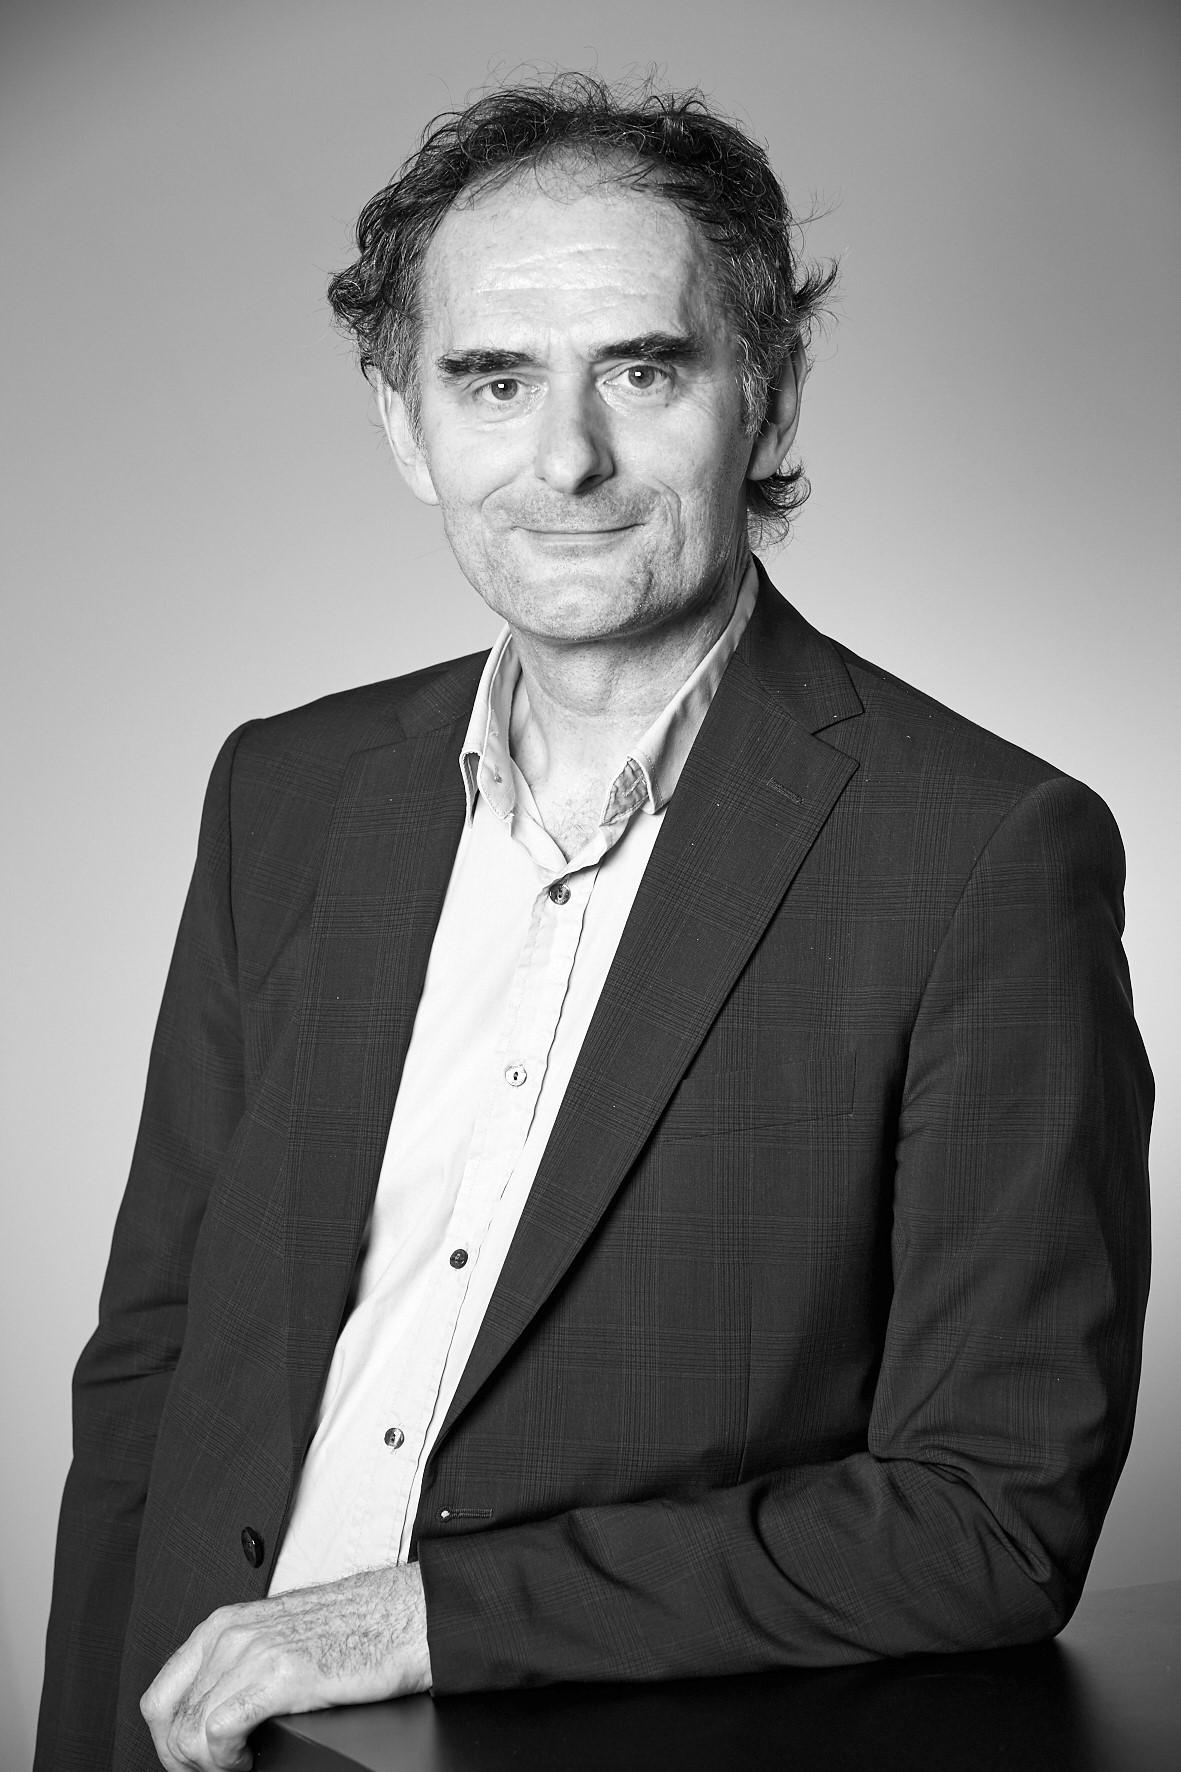 Michael Podgorschek